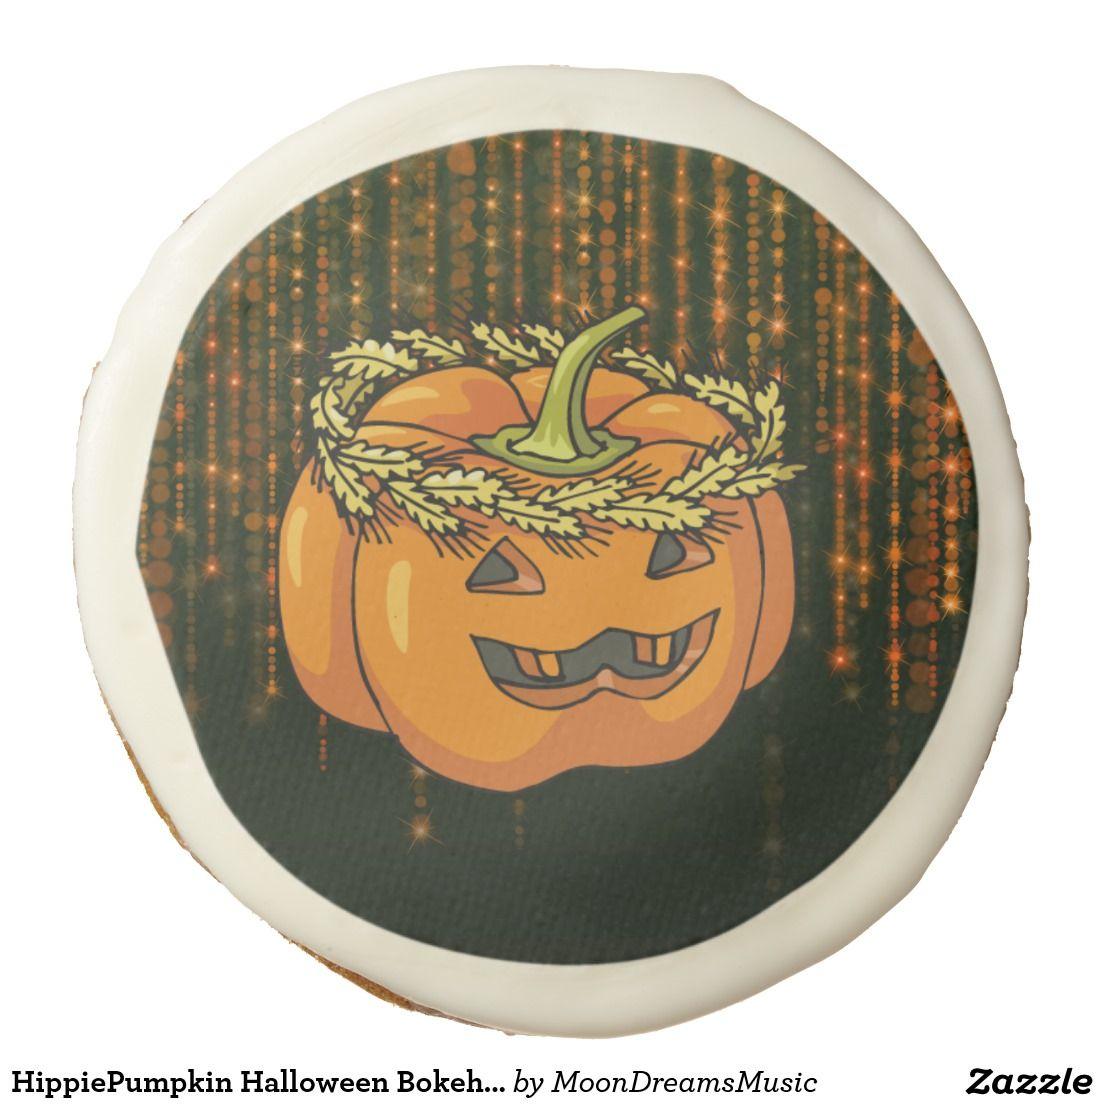 #HippiePumpkin #HalloweenBokehLights #SugarCookies by #MoonDreamsMusic #OneDozenCookies #HalloweenTreats